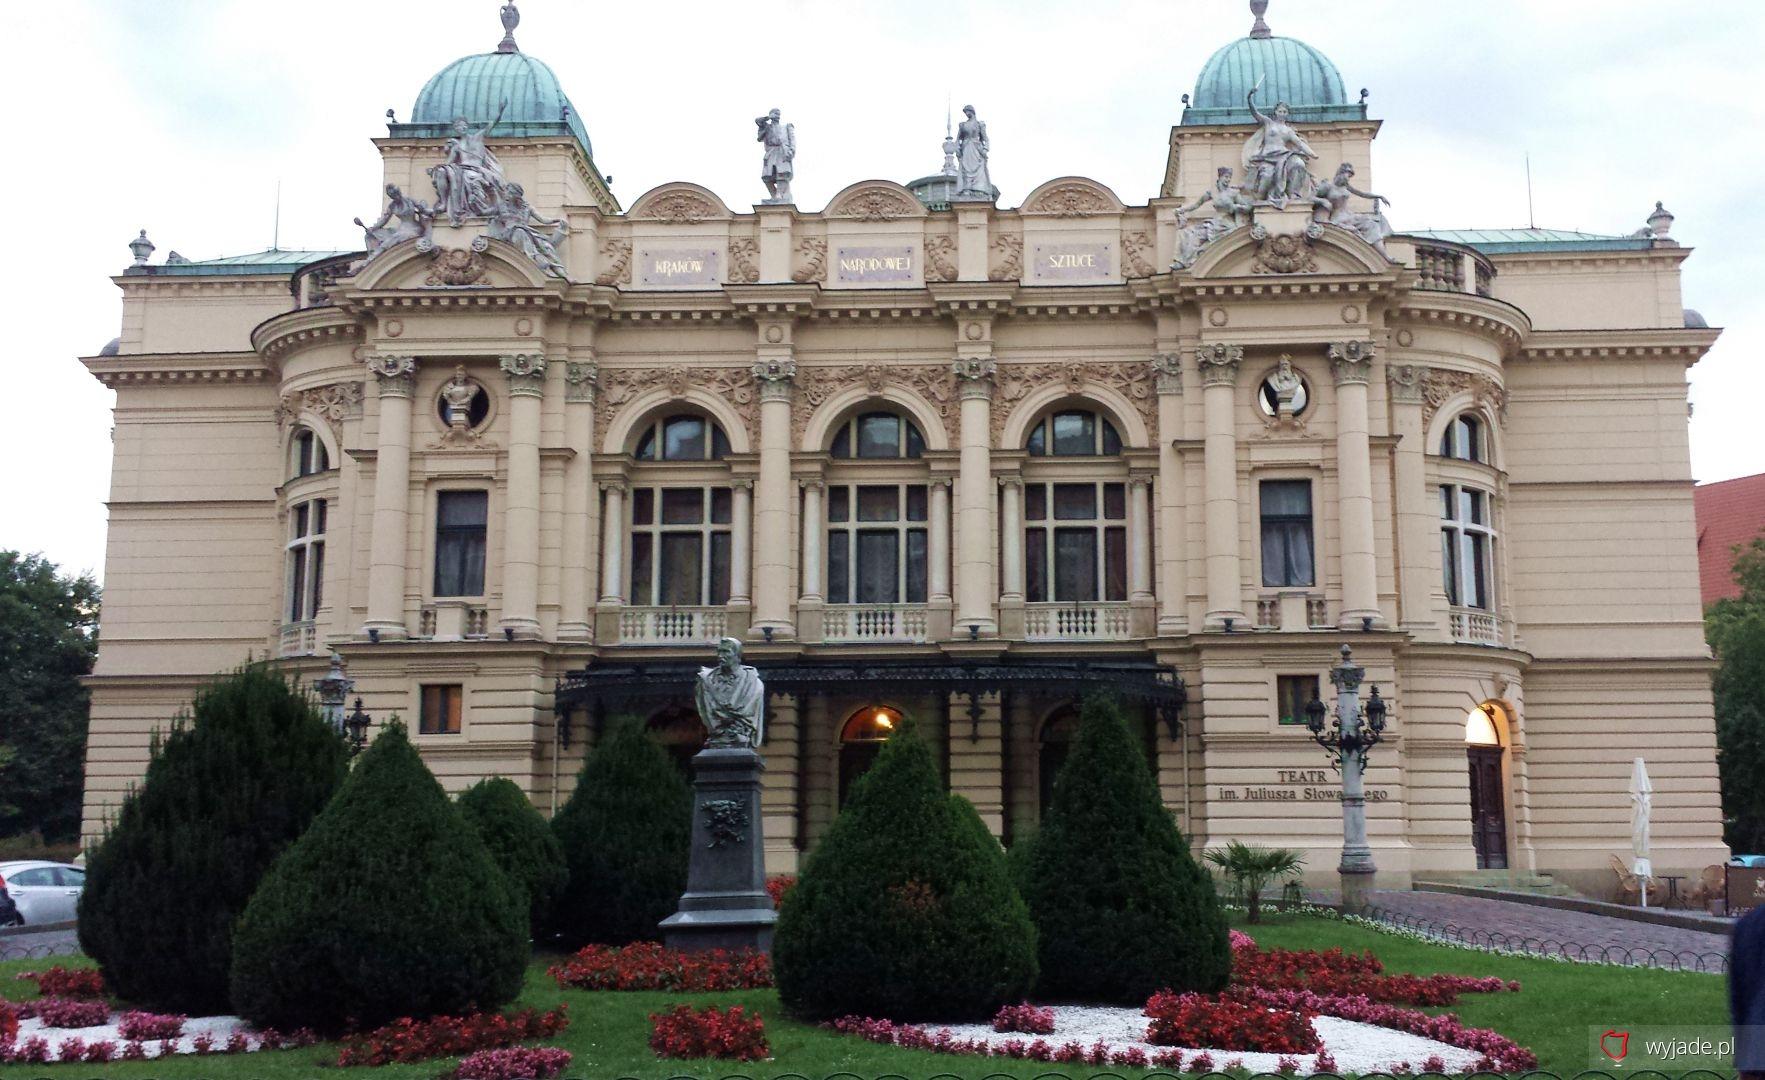 Teatr im. Juliusz Słowacki